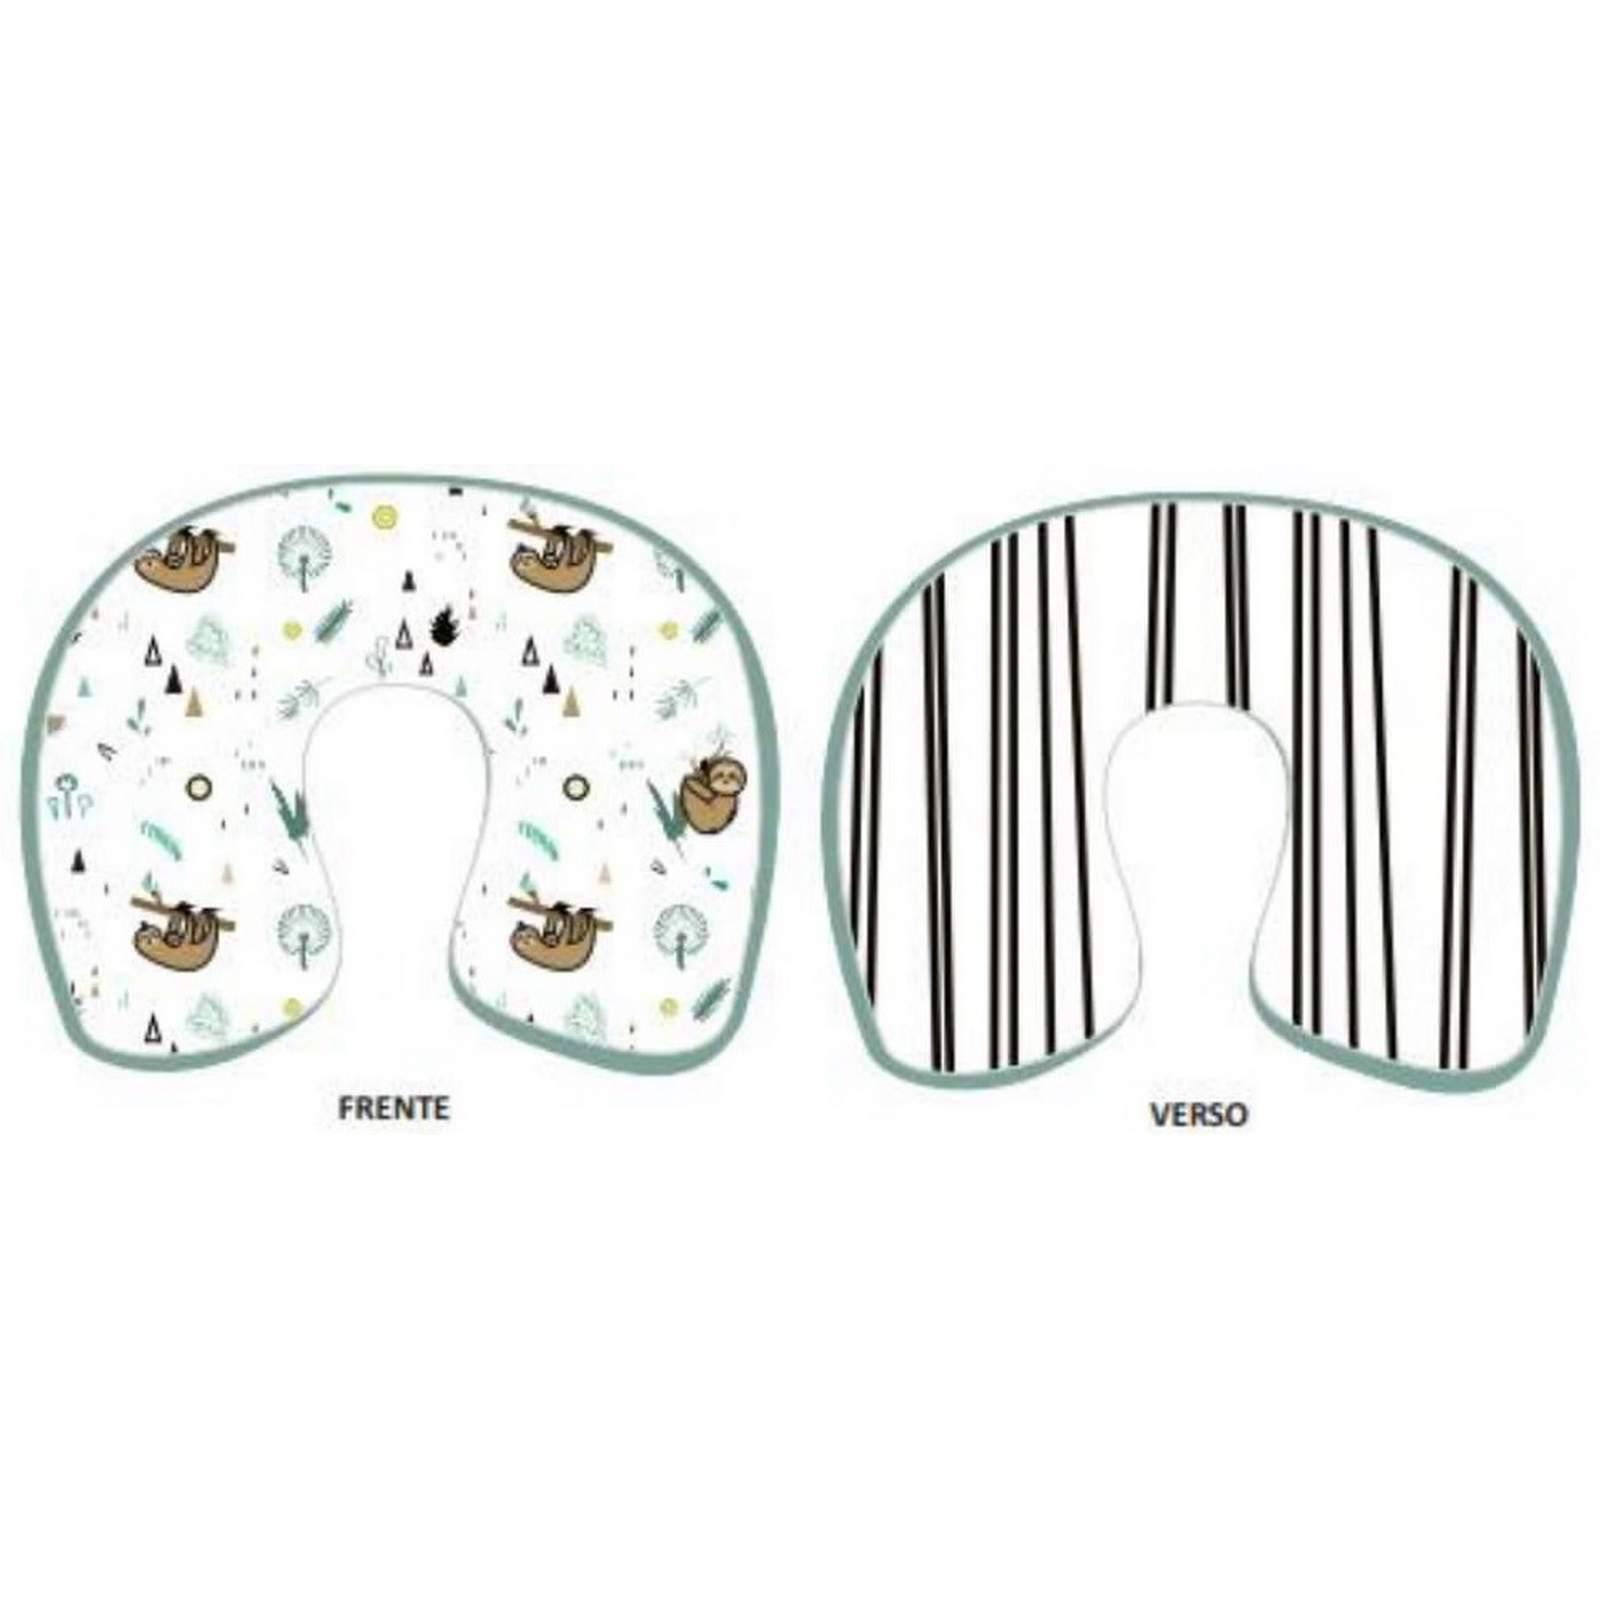 Almofada Amamentação - Zen Tec. Microfibra